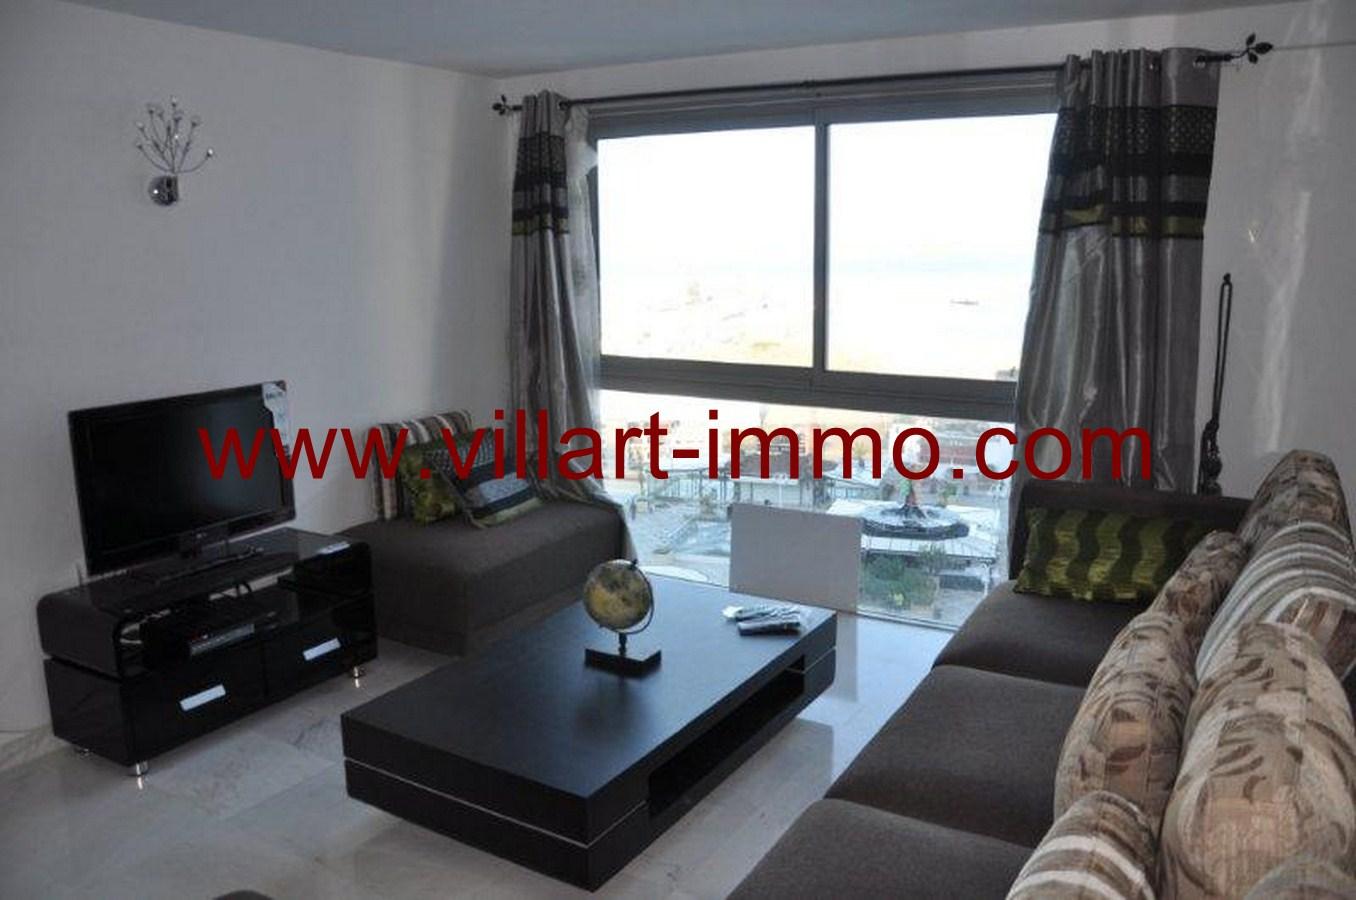 1-vente-appartement-tanger-centre-de-ville-salon-1-va462-villart-immo